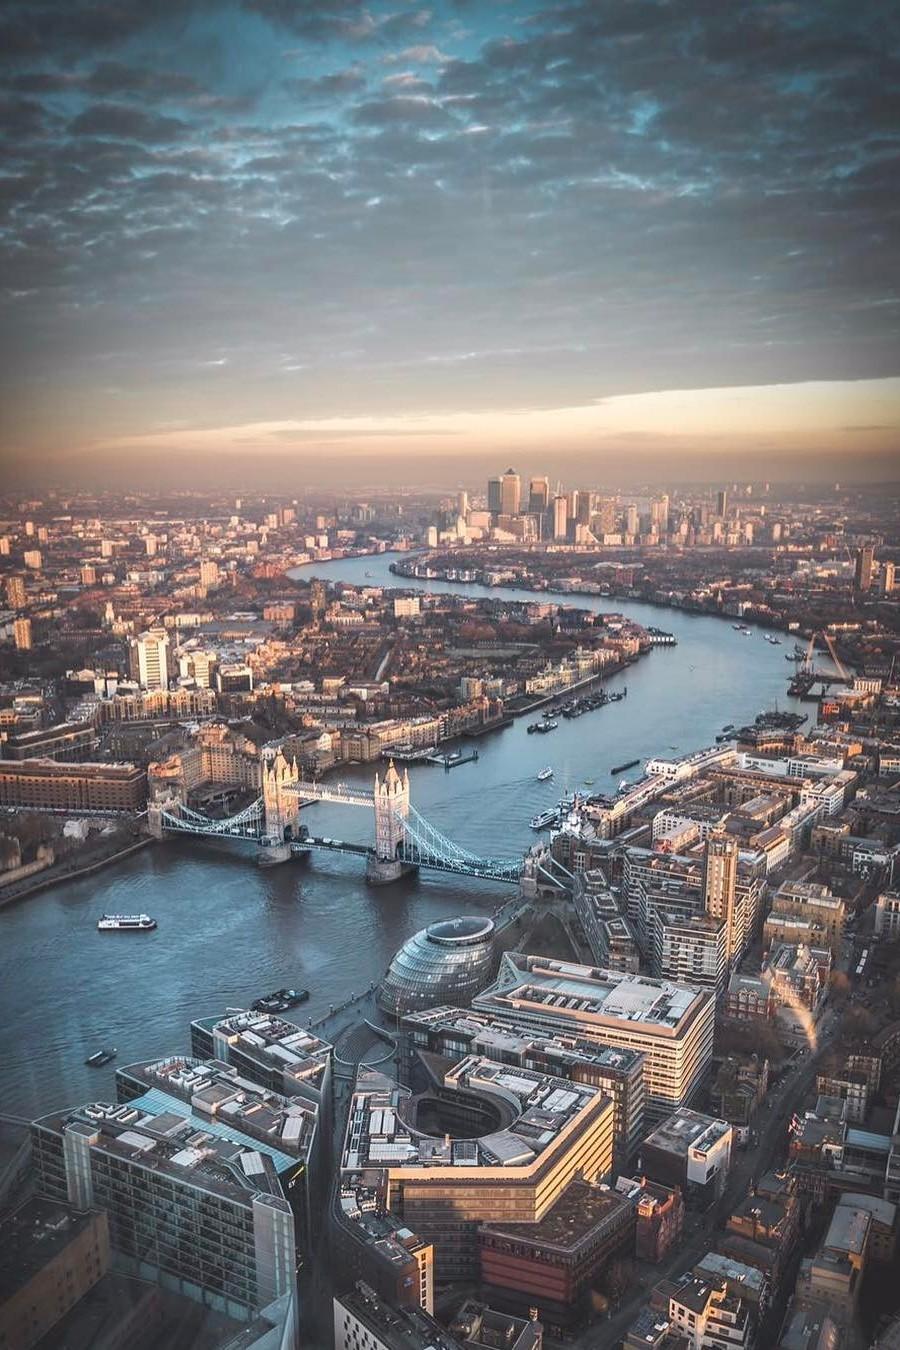 london city travel architecture cityscape harbor skyline town